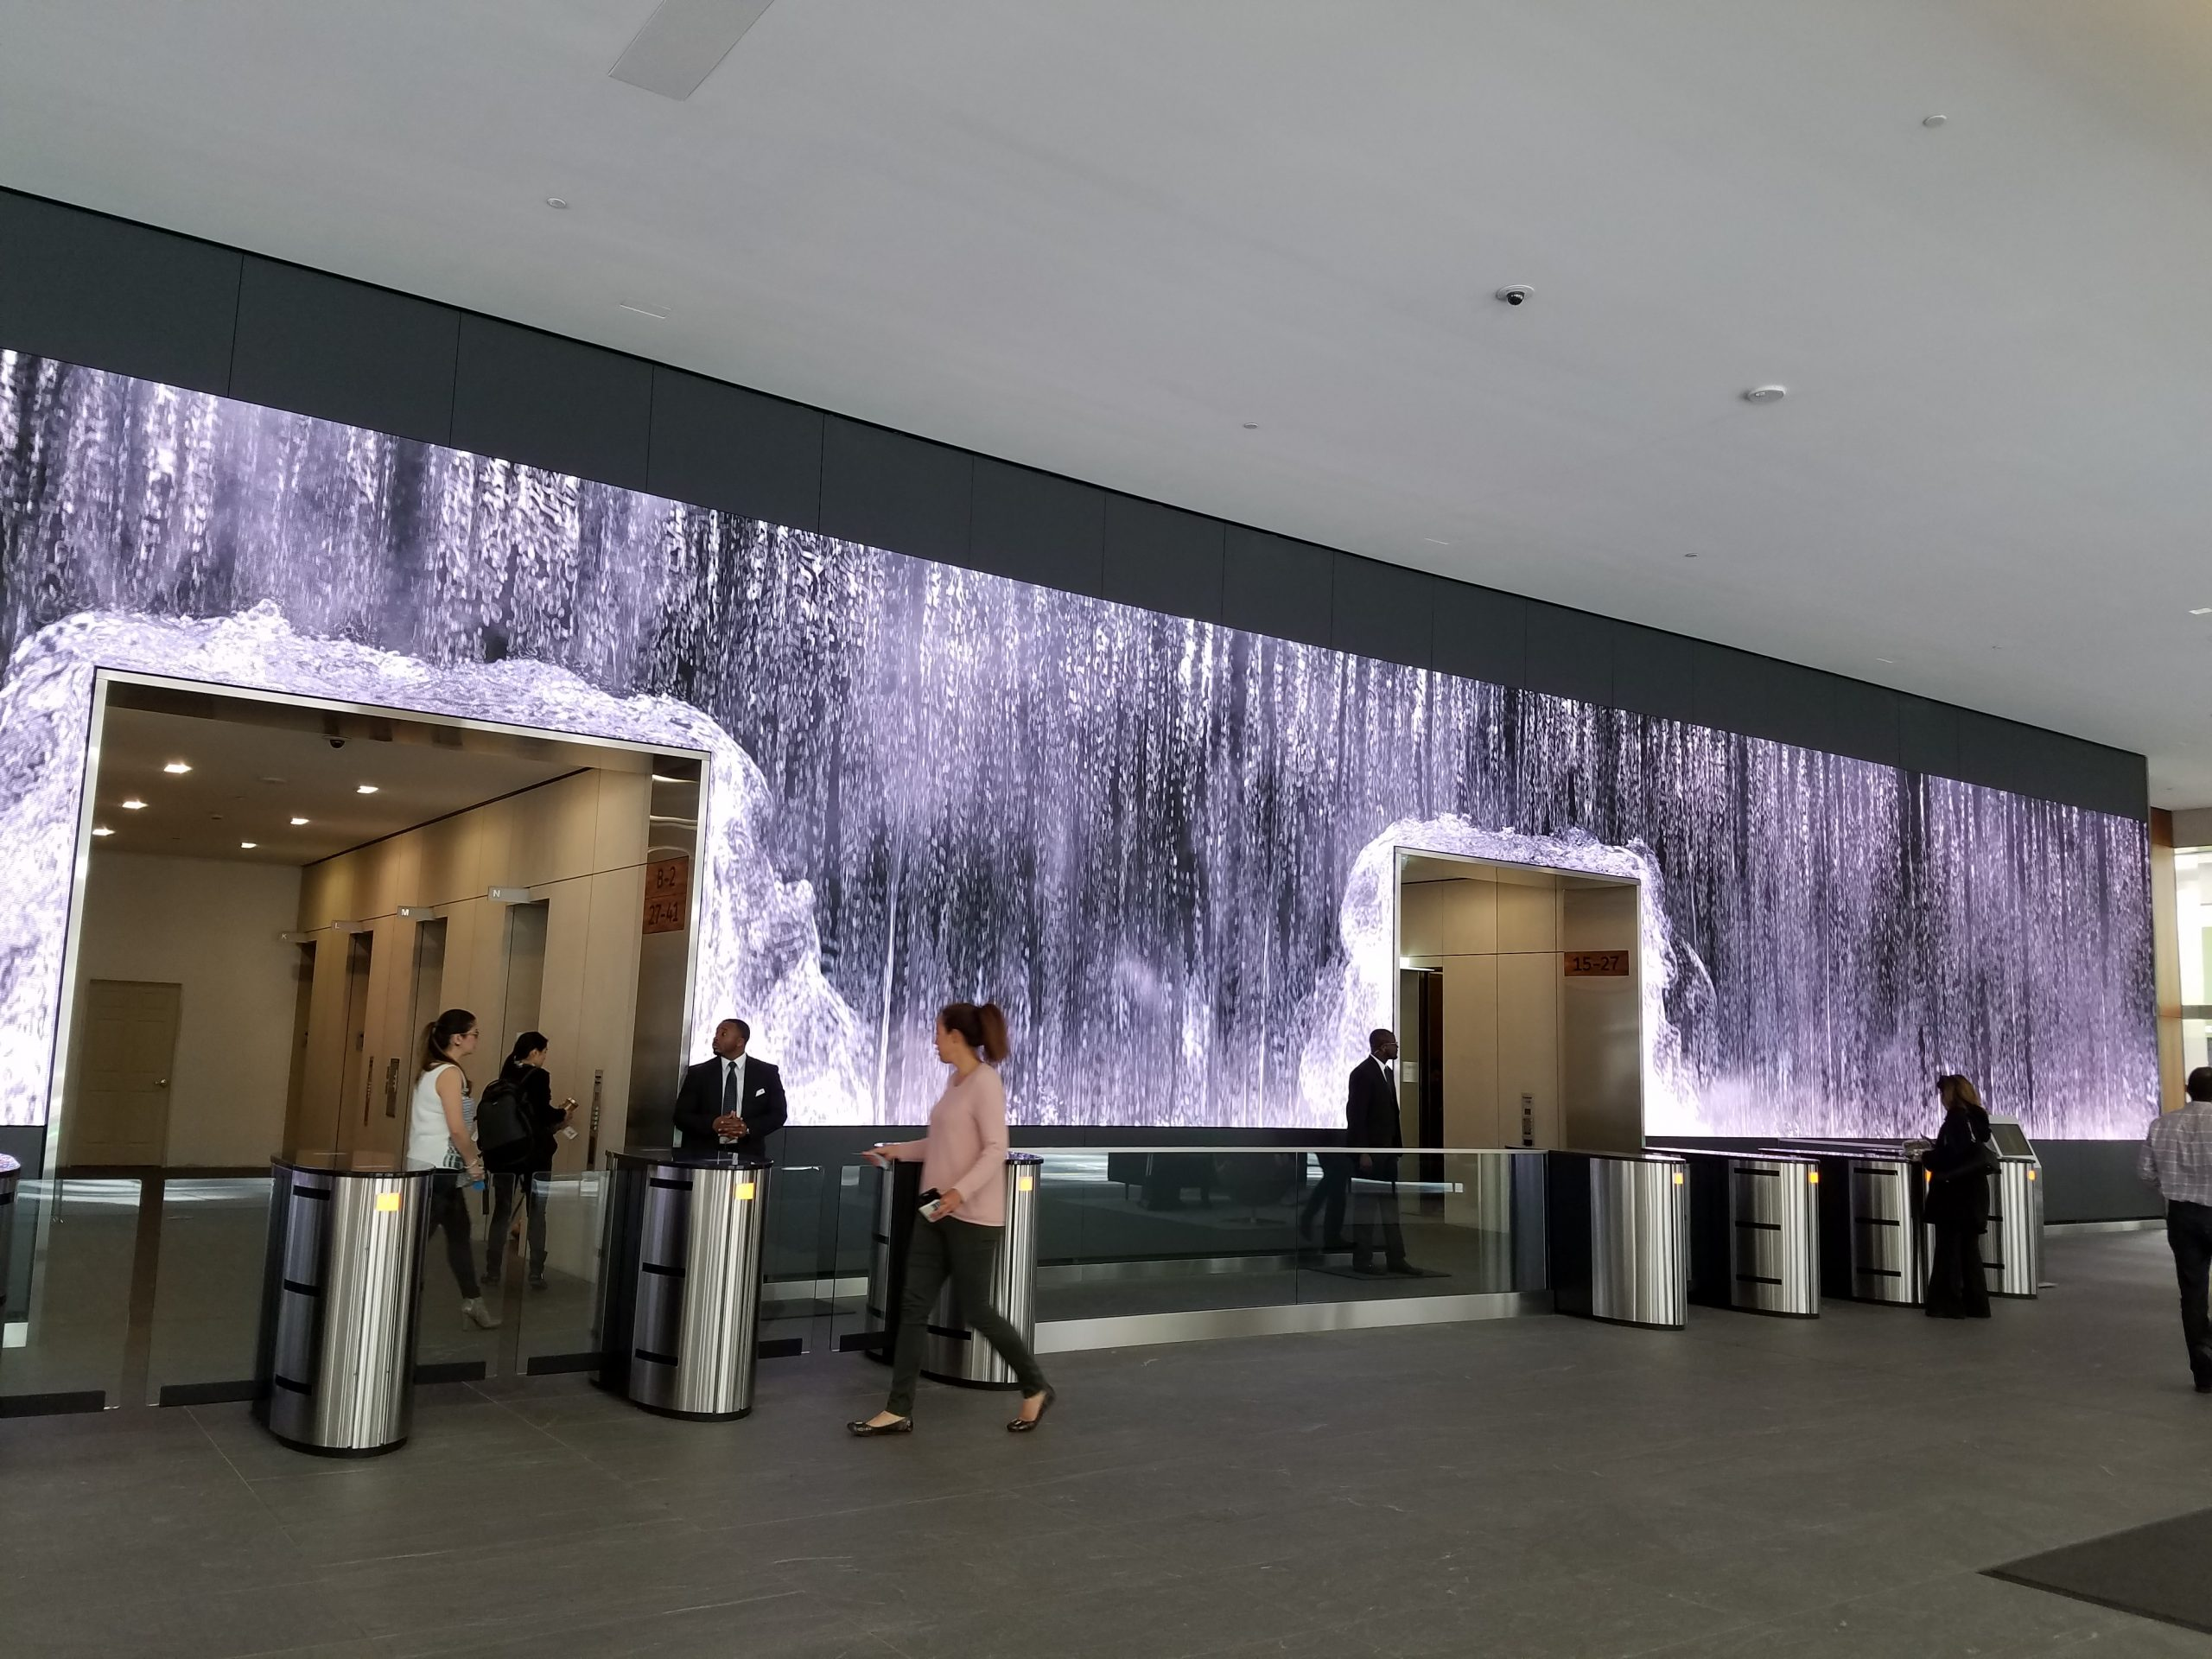 Waterfall Video Wall – Salesforce Lobby